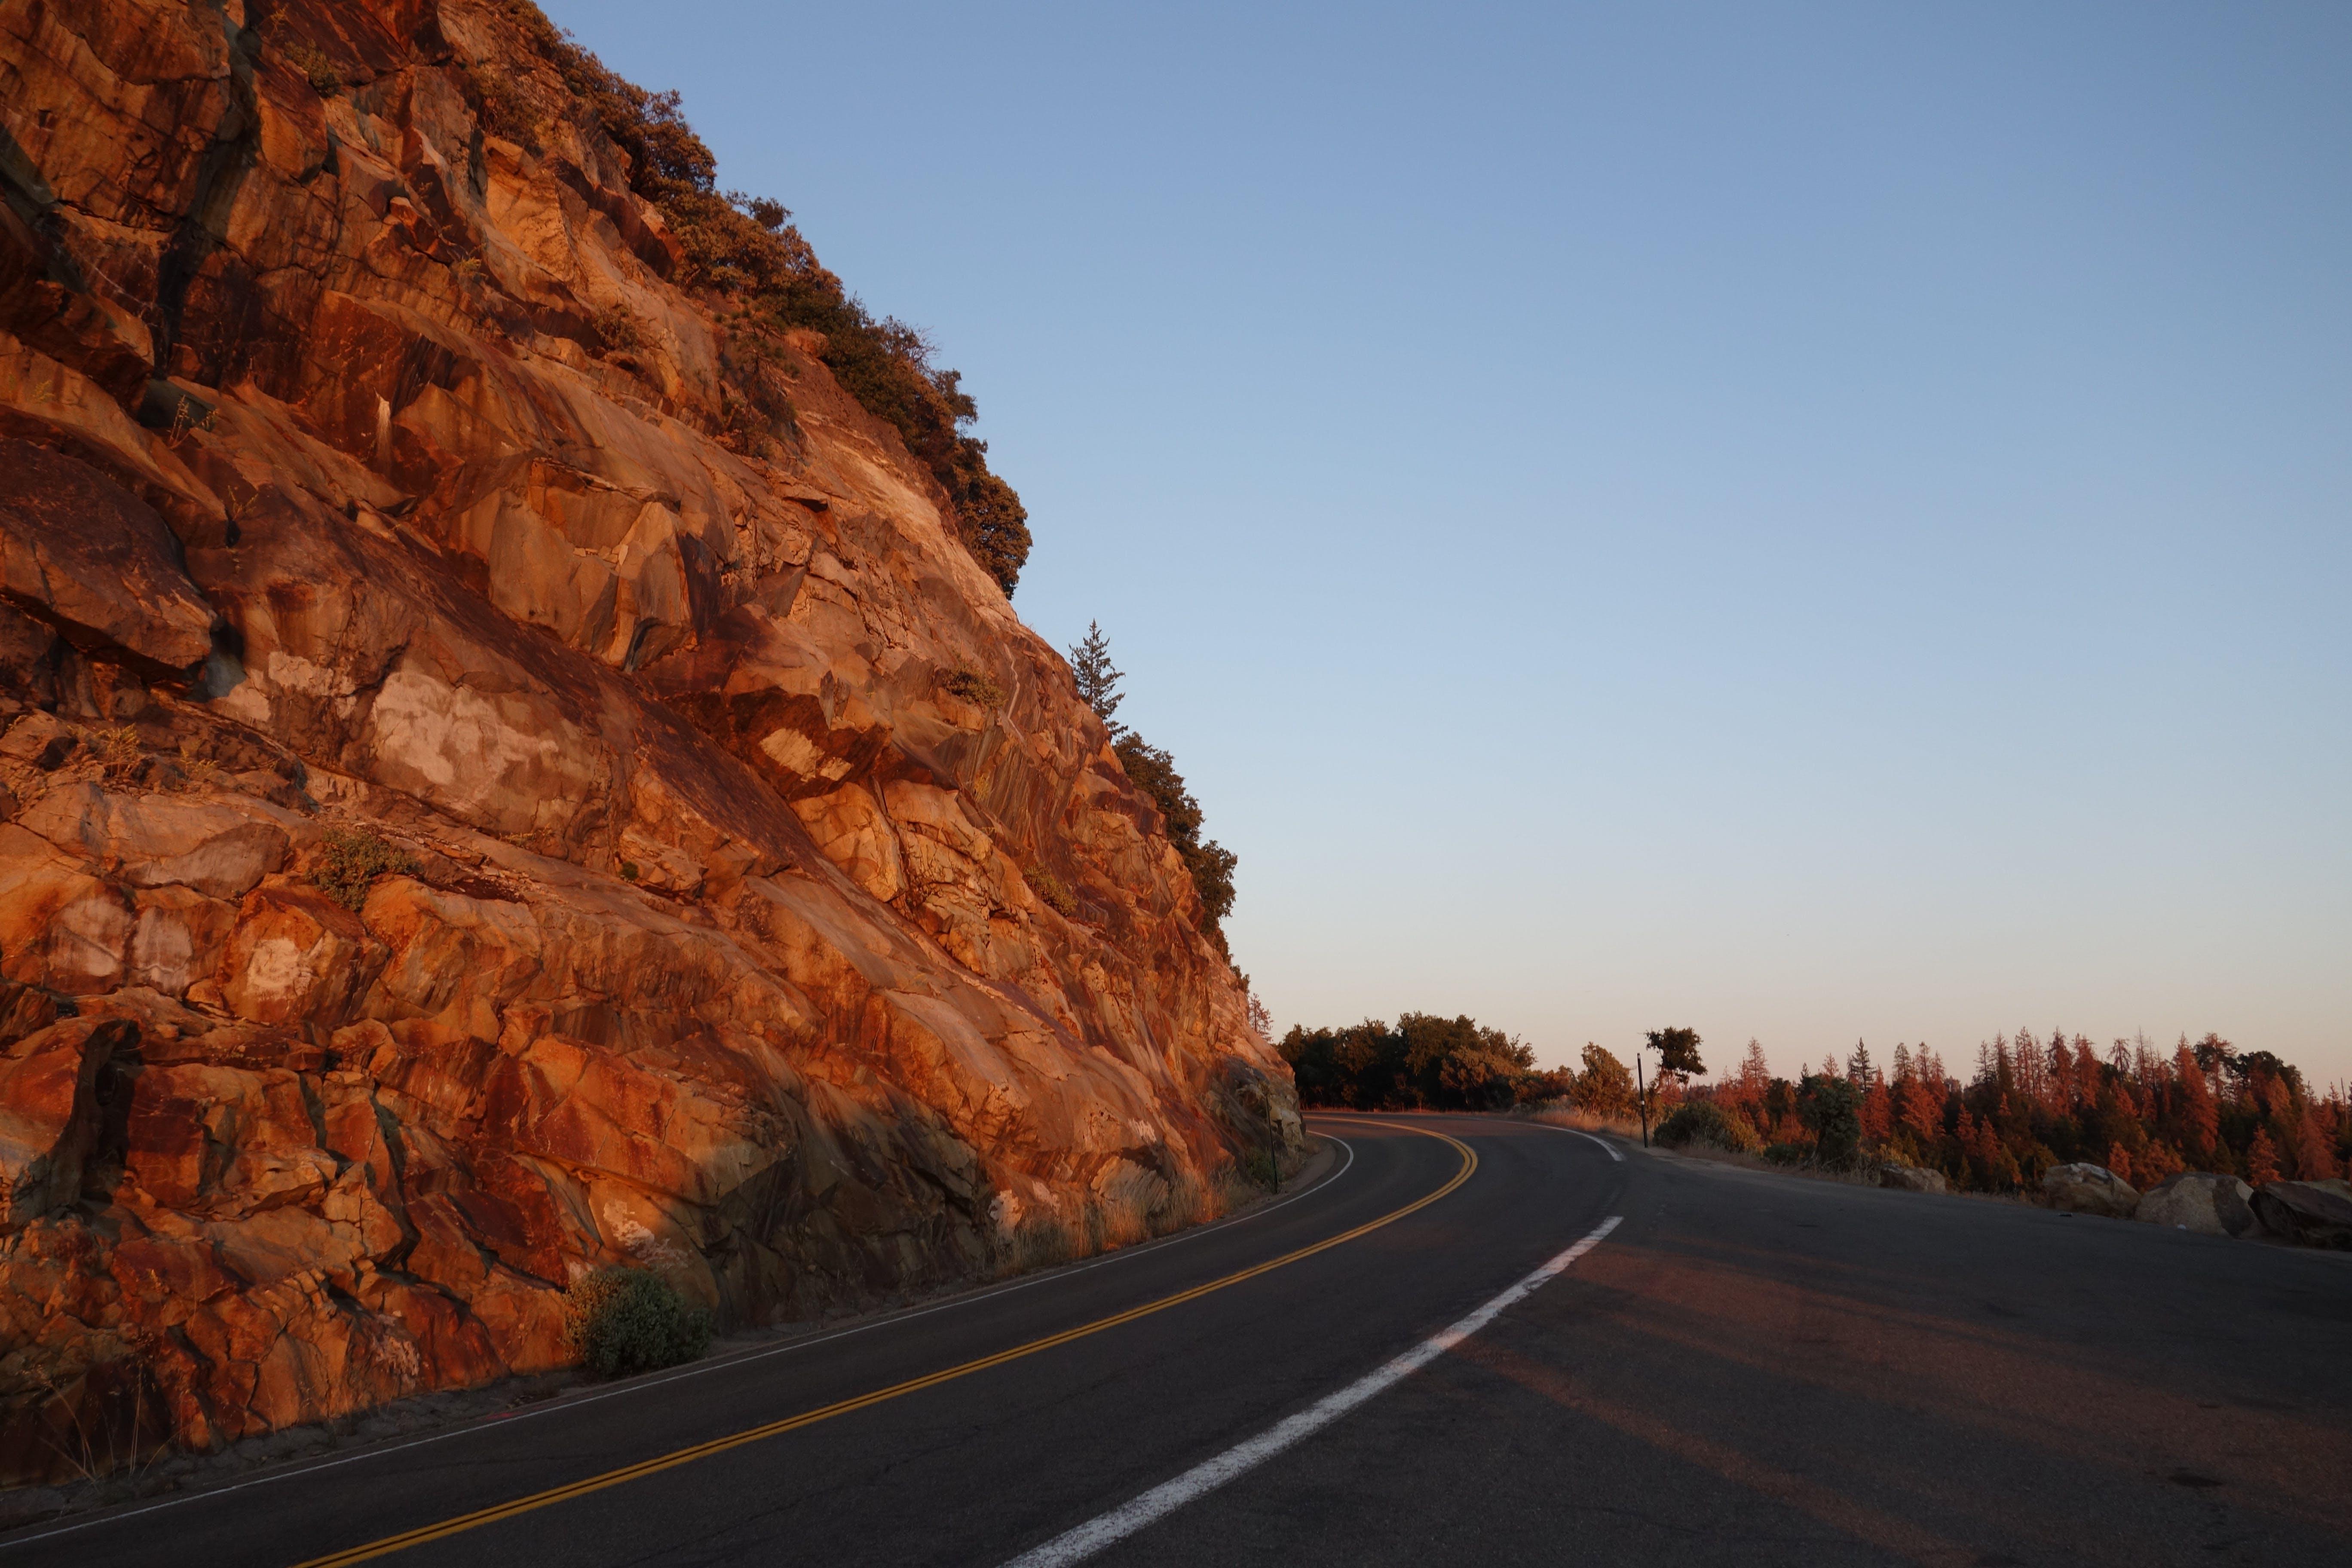 Asphalt Road Beside Mountain